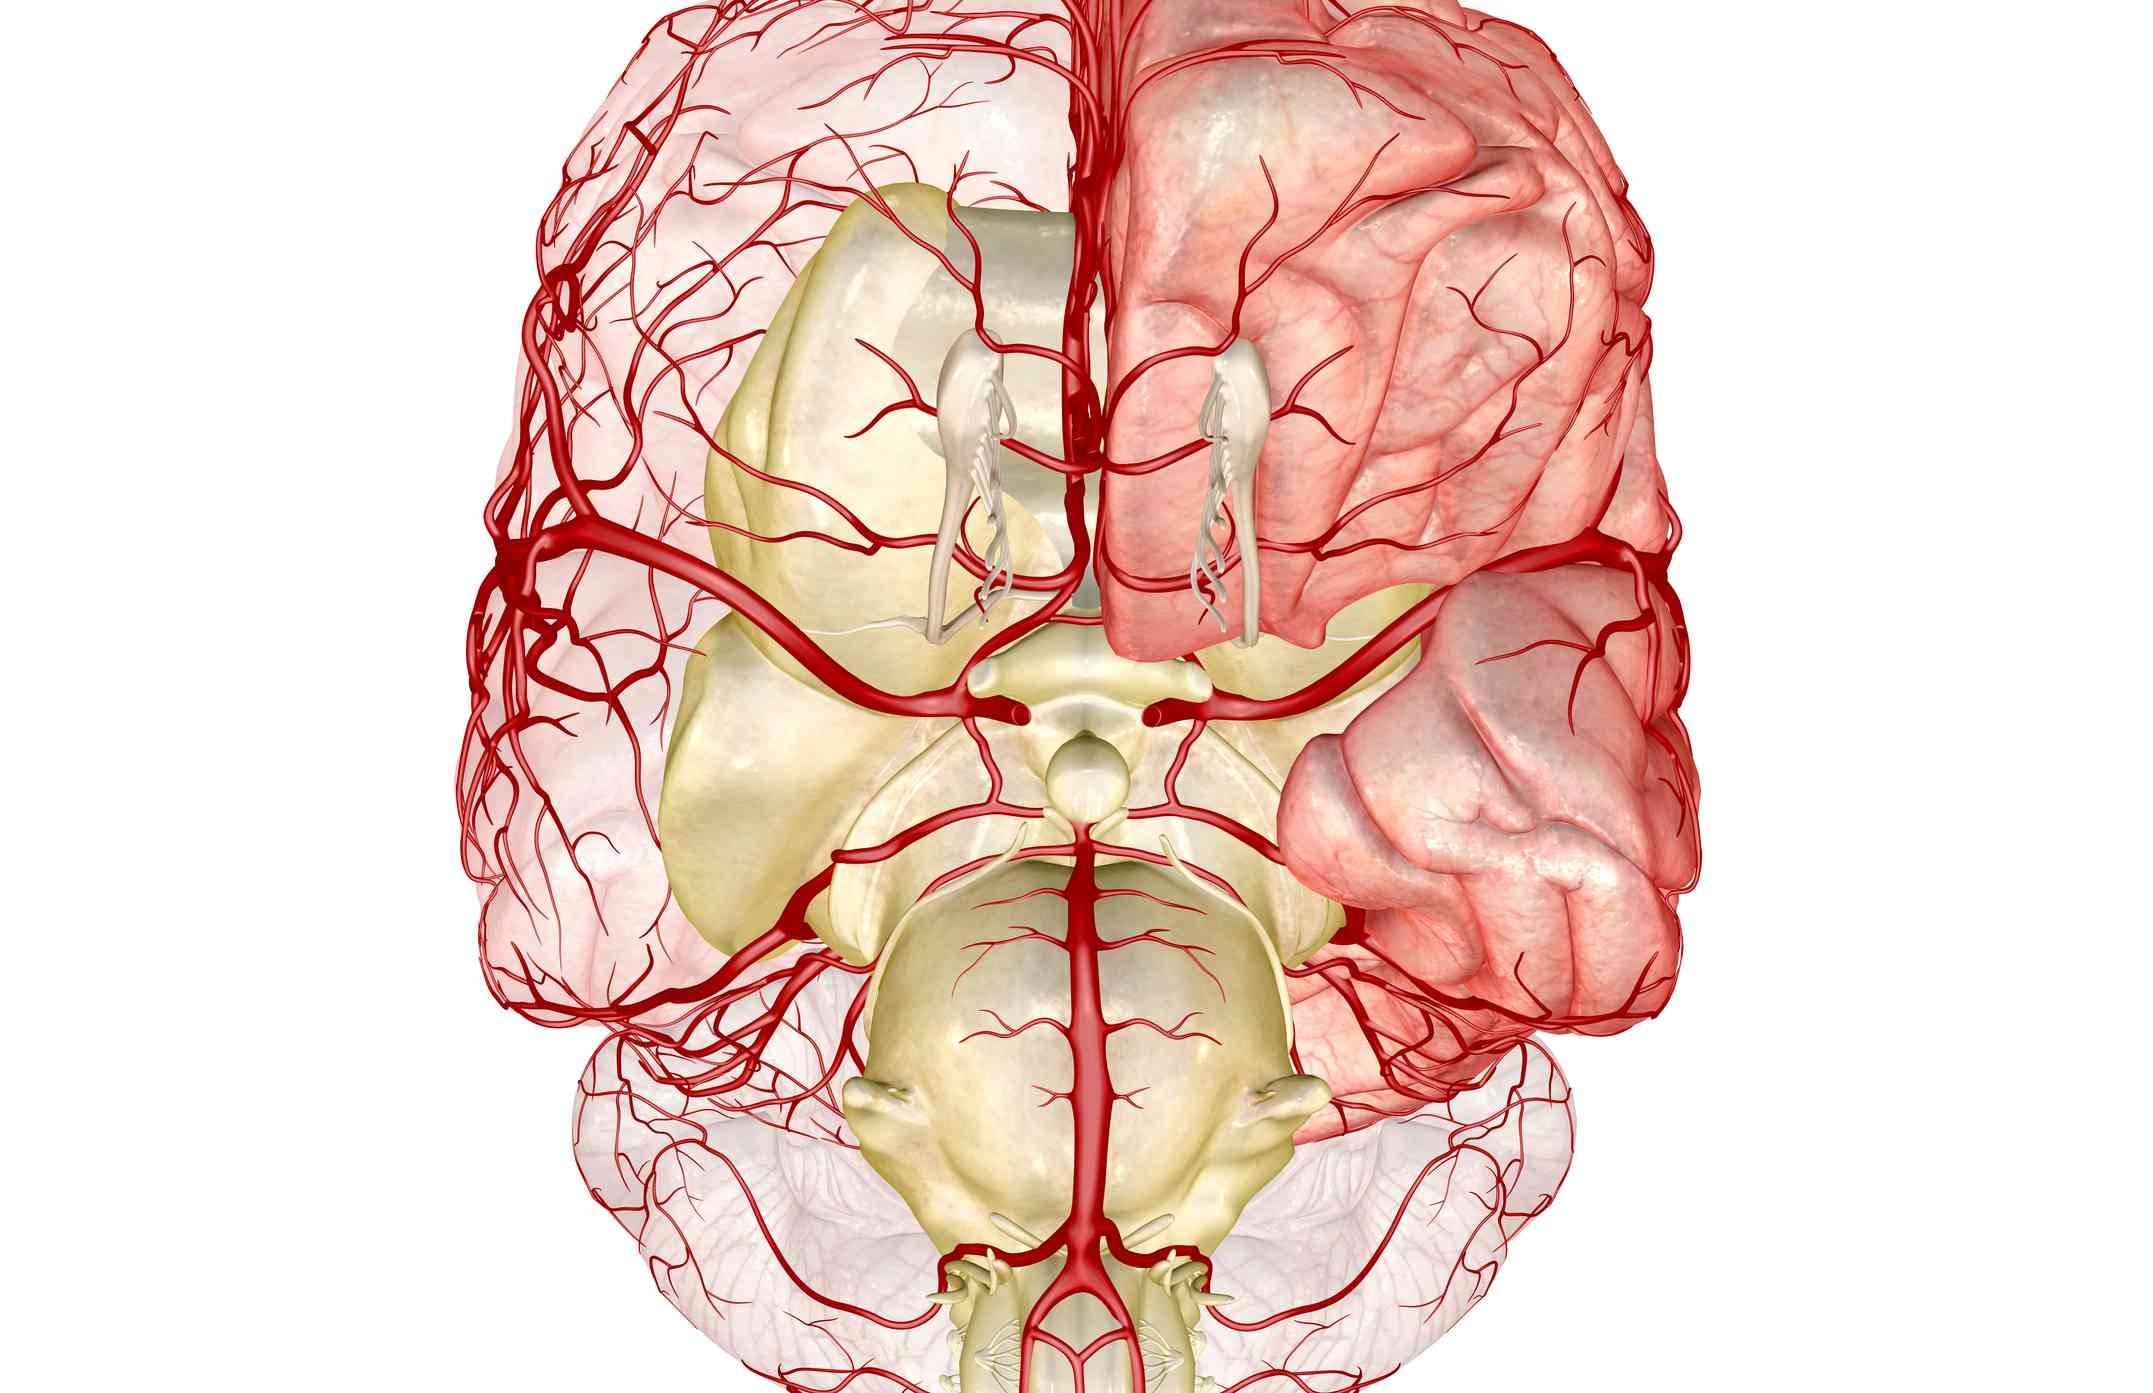 Posterior Communicating Artery Anatomy, Function